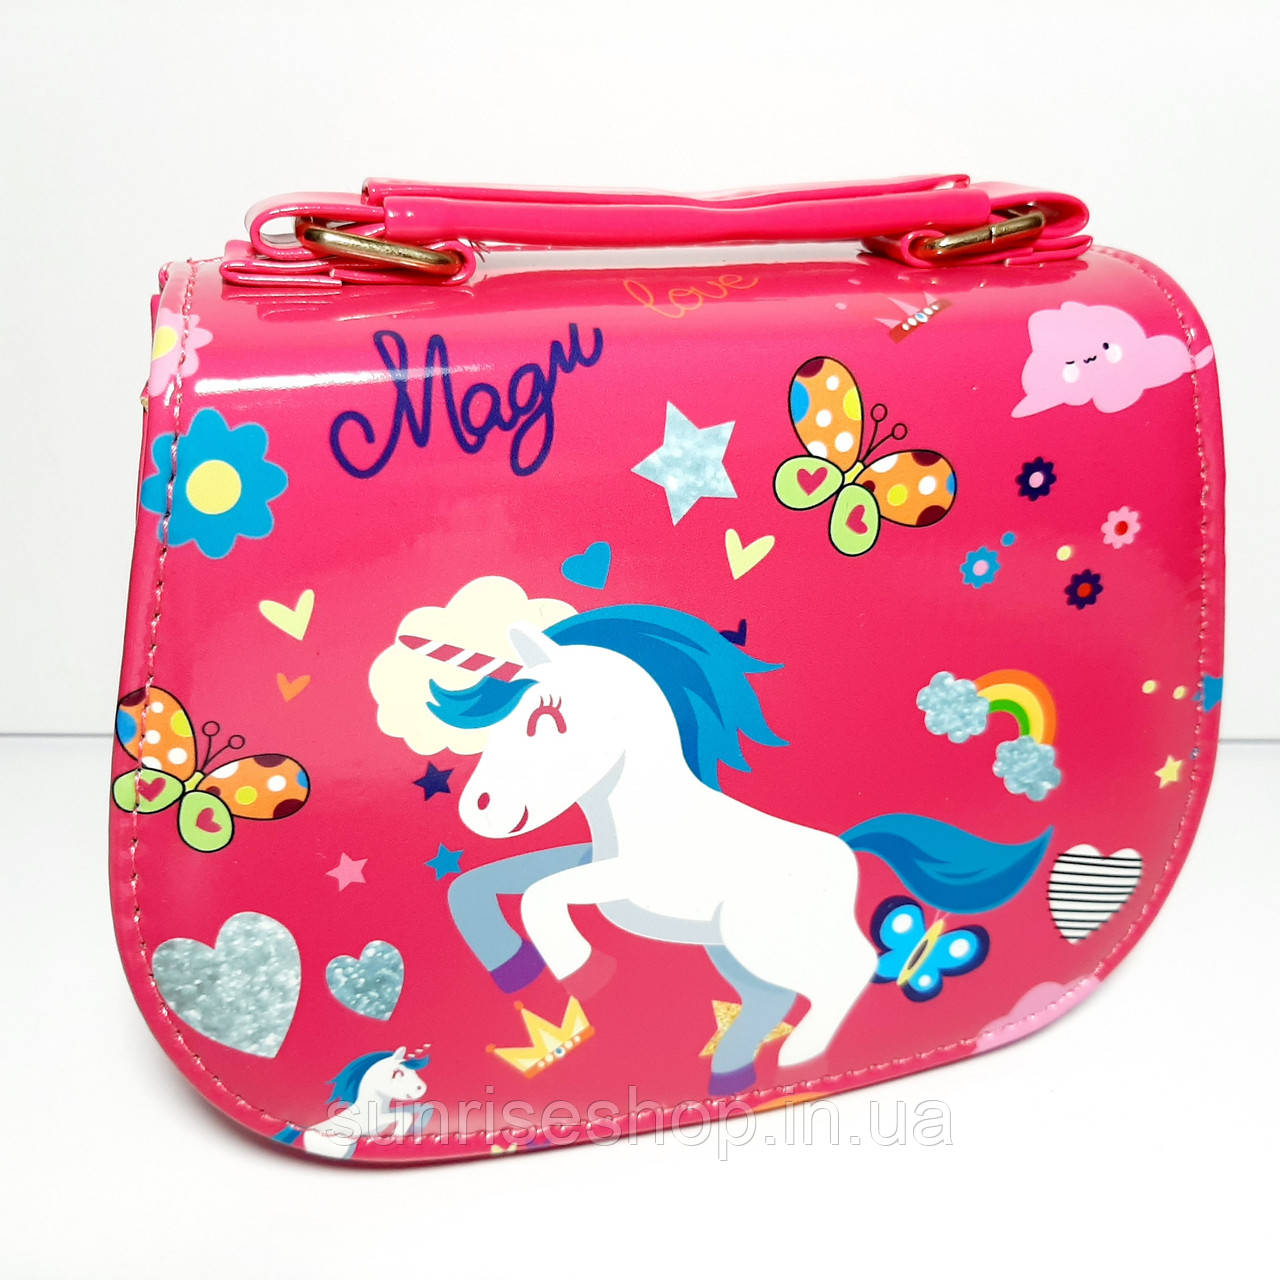 Детская сумочка лаковая